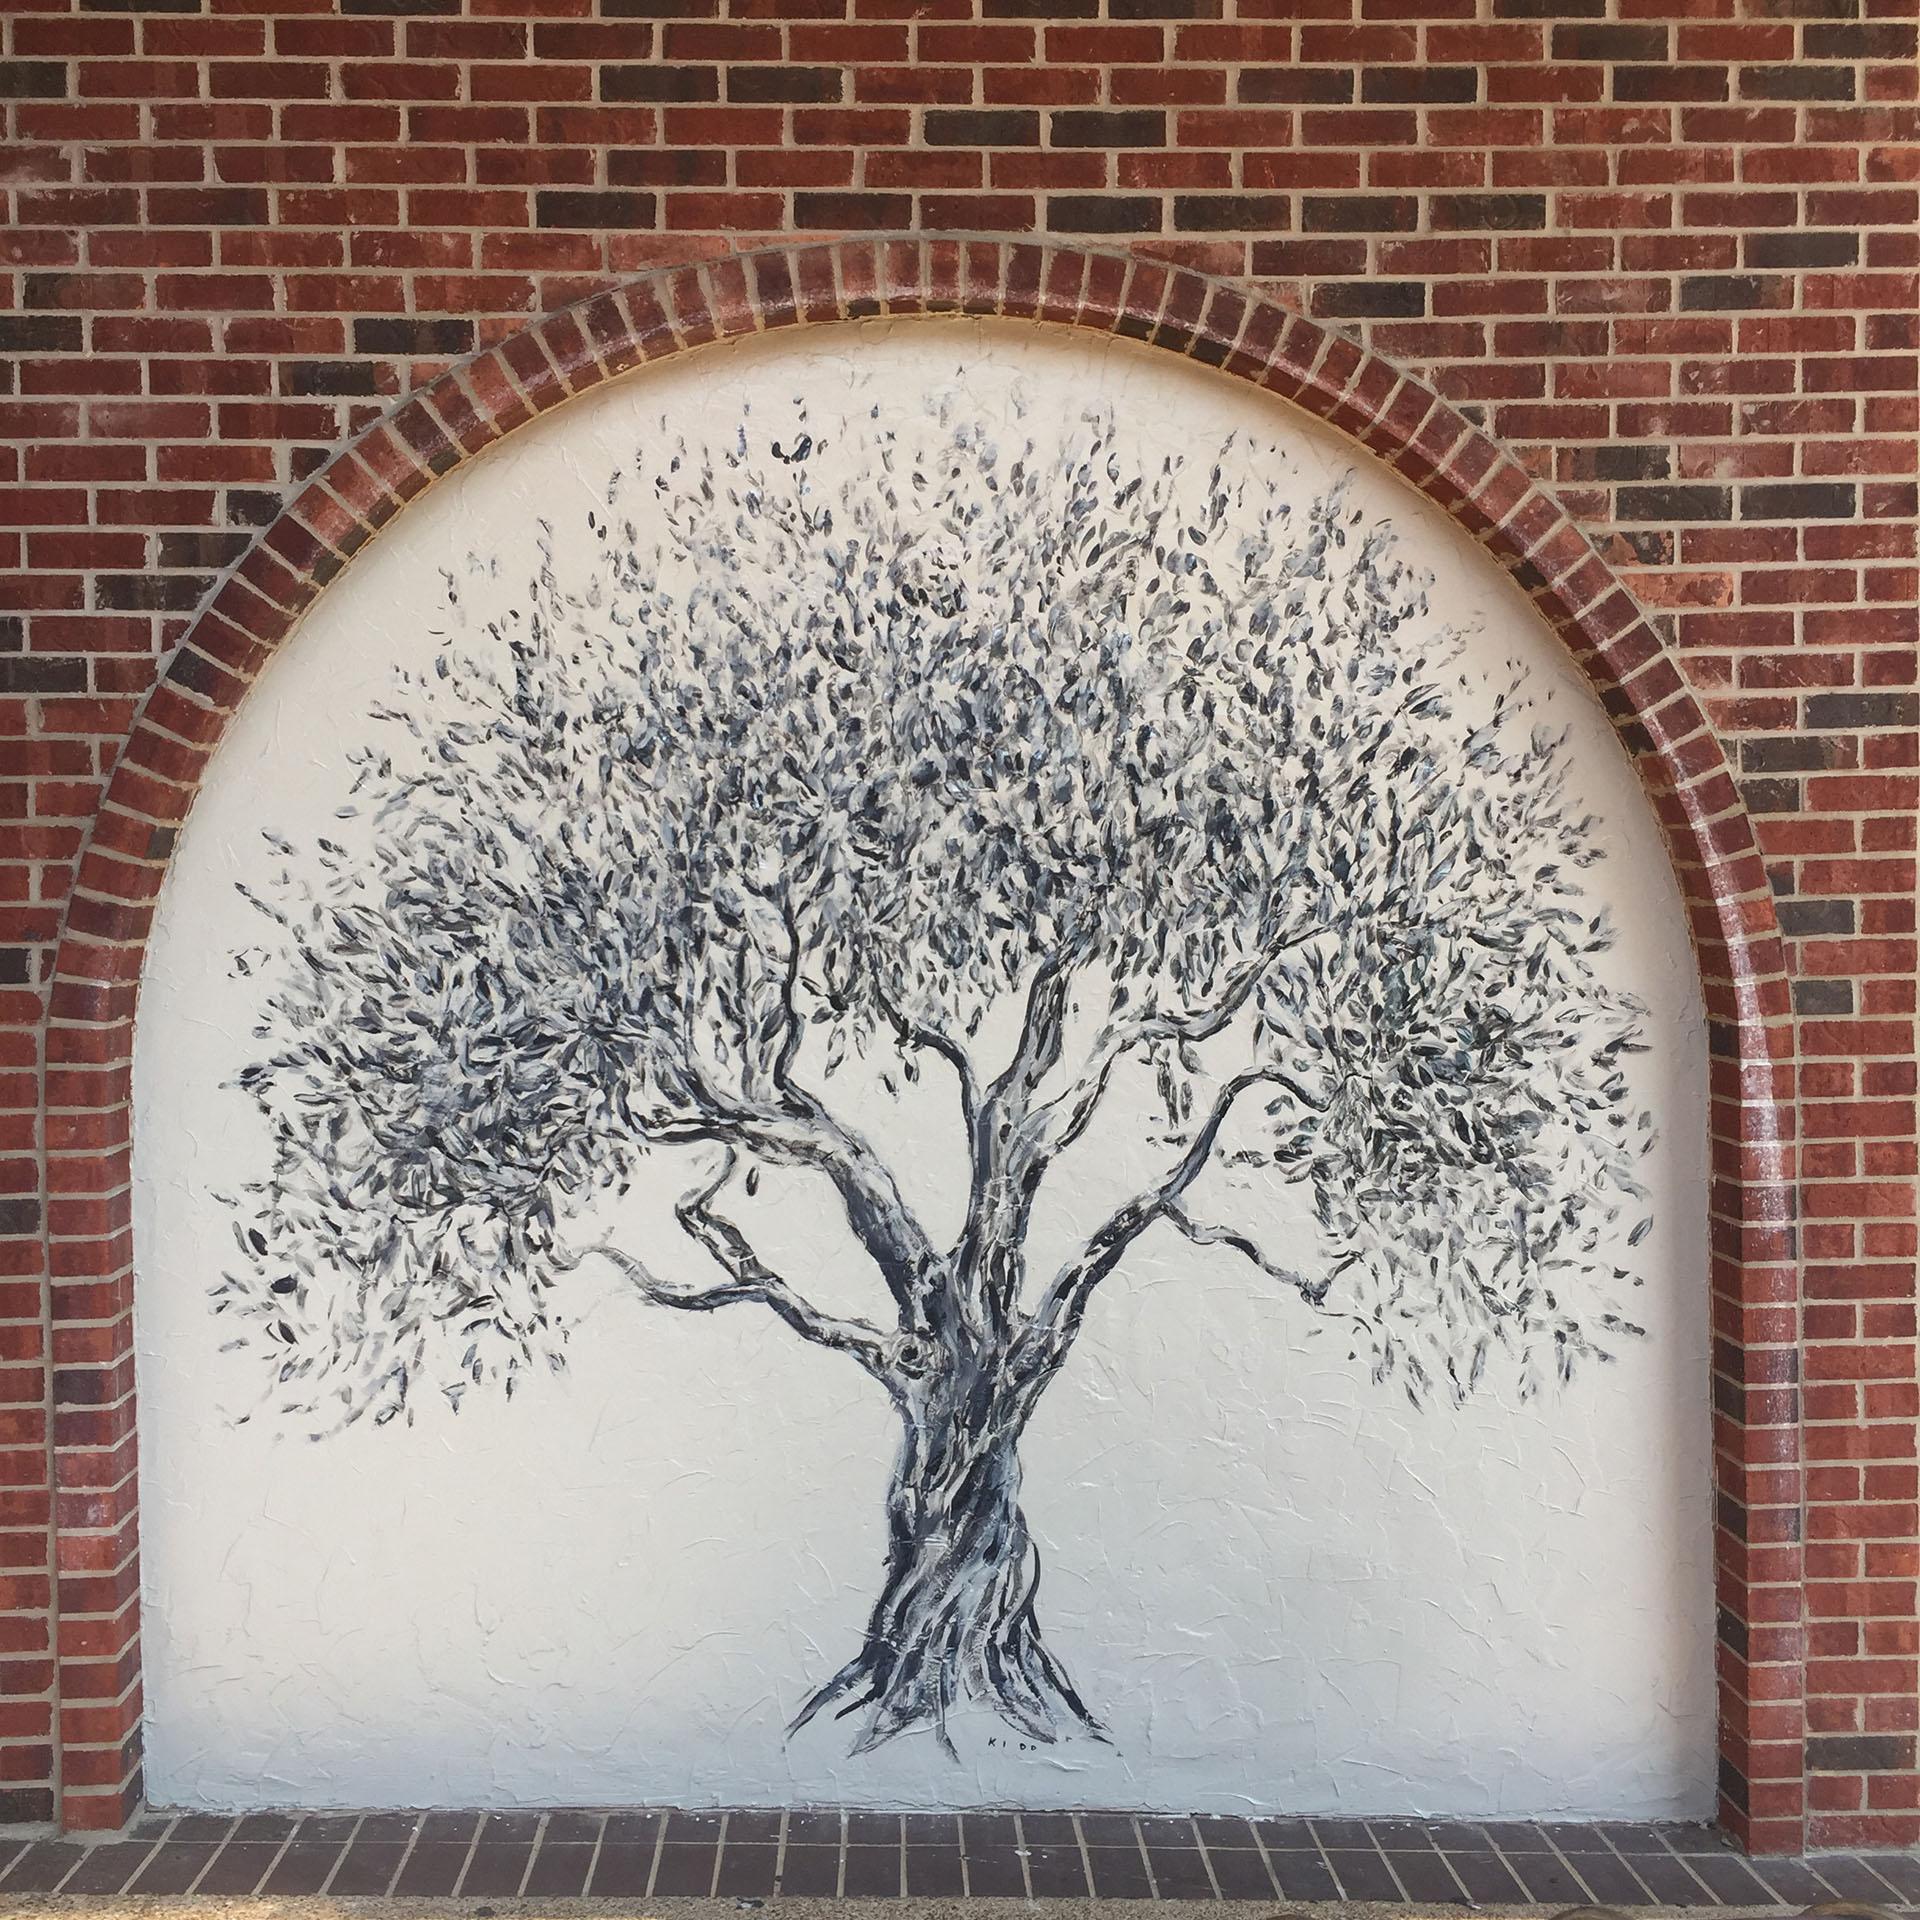 olive tree - tree mural - custom mural - mural - Dace Kidd - Mural Artist Tx